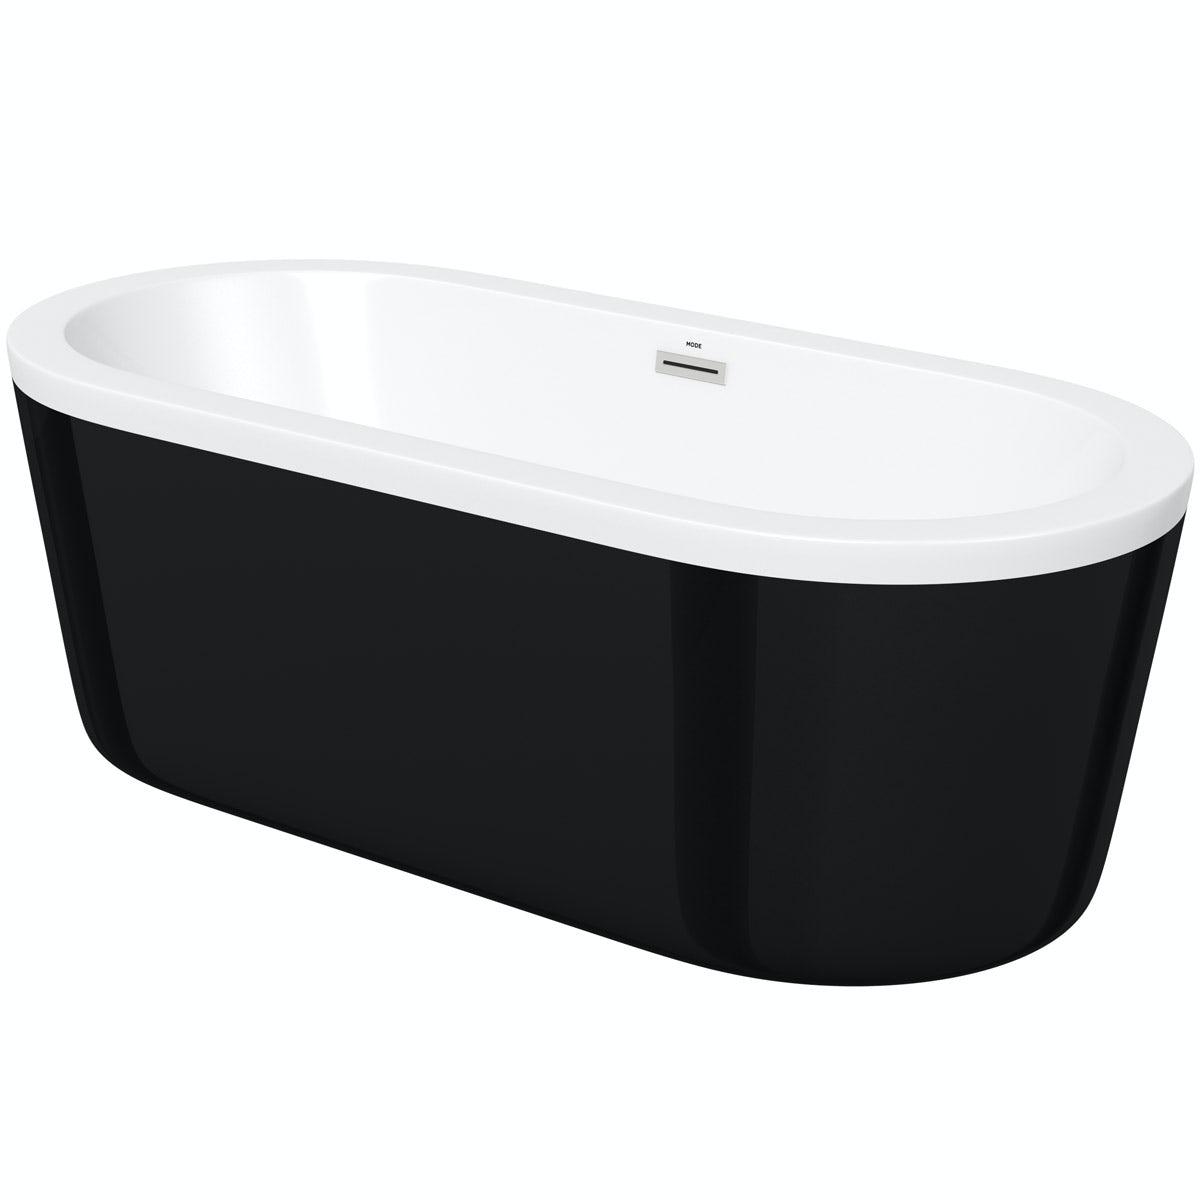 Orchard Wharfe black freestanding bath